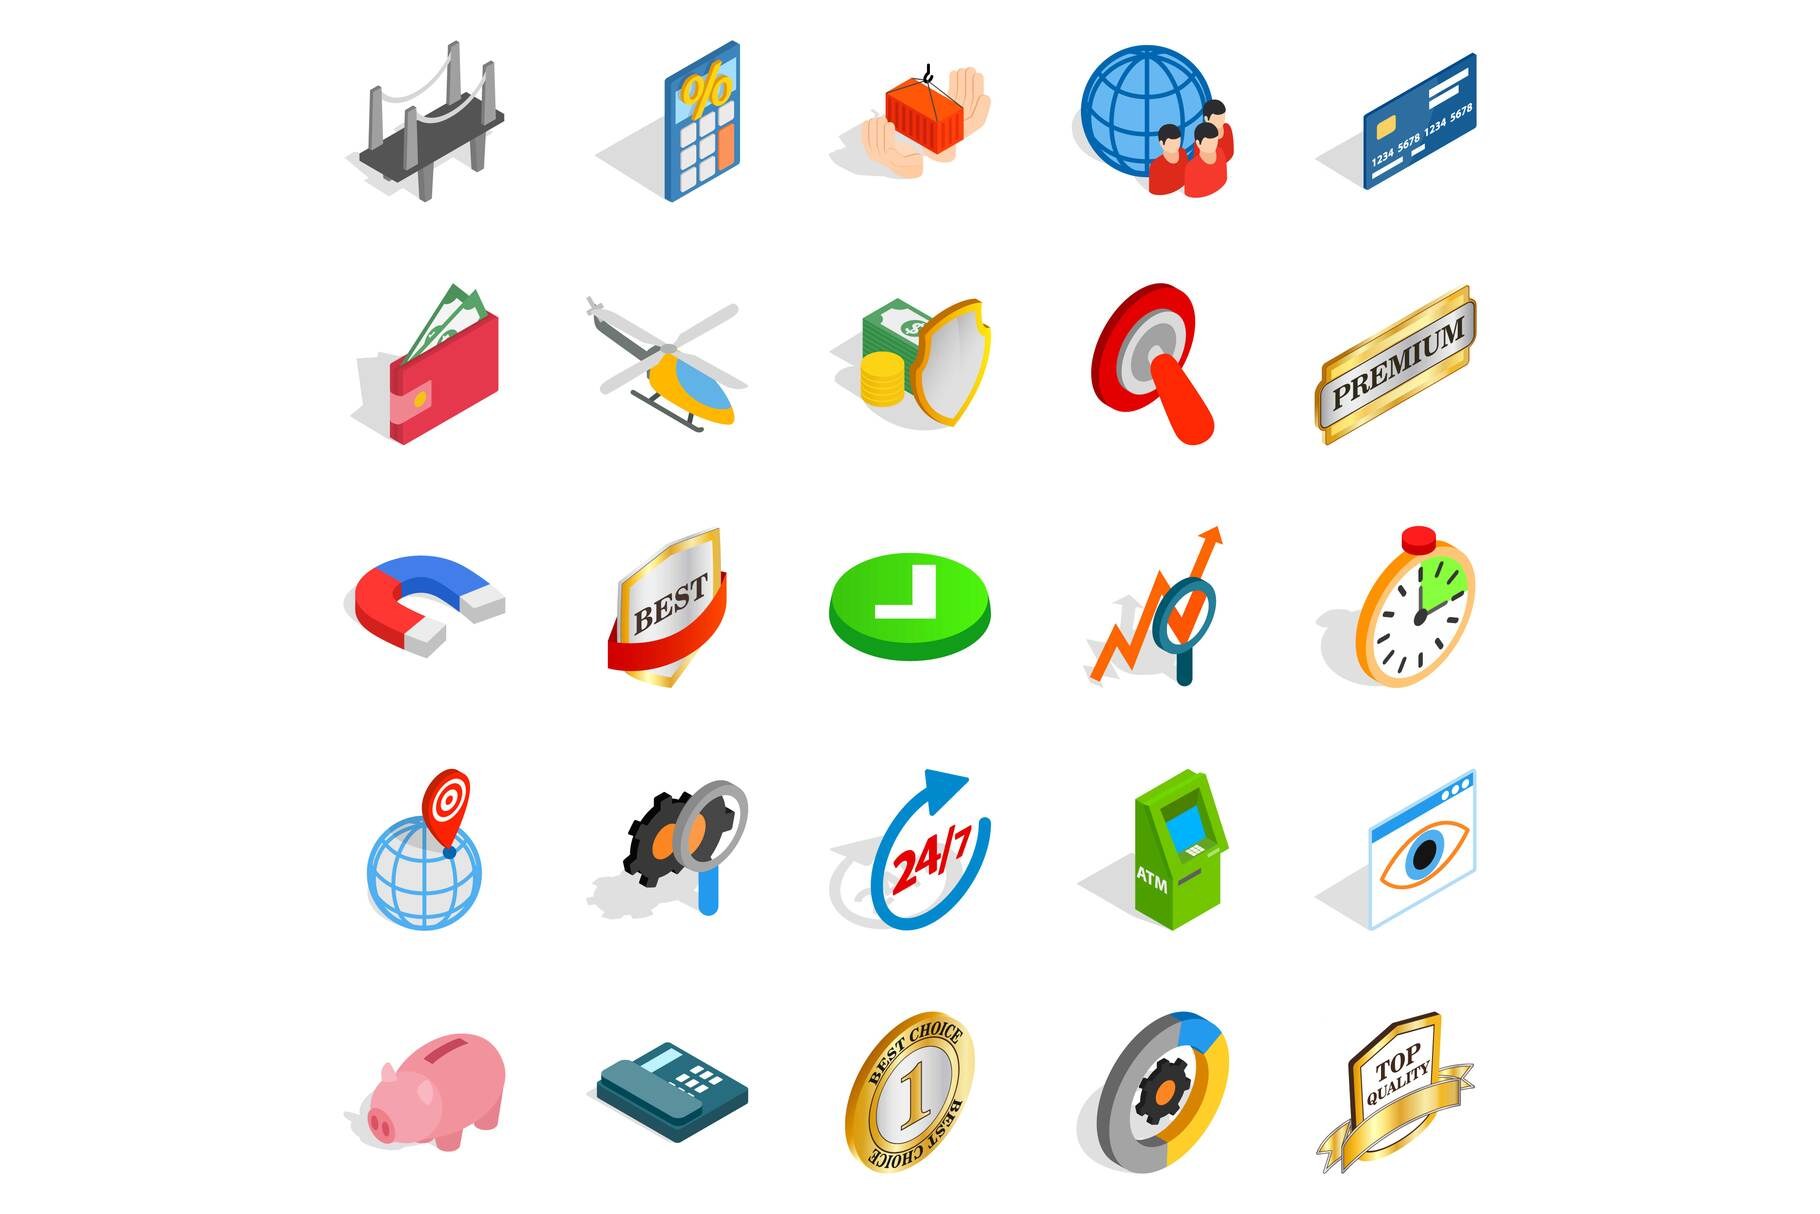 Business planning icons set, isometric style example image 1